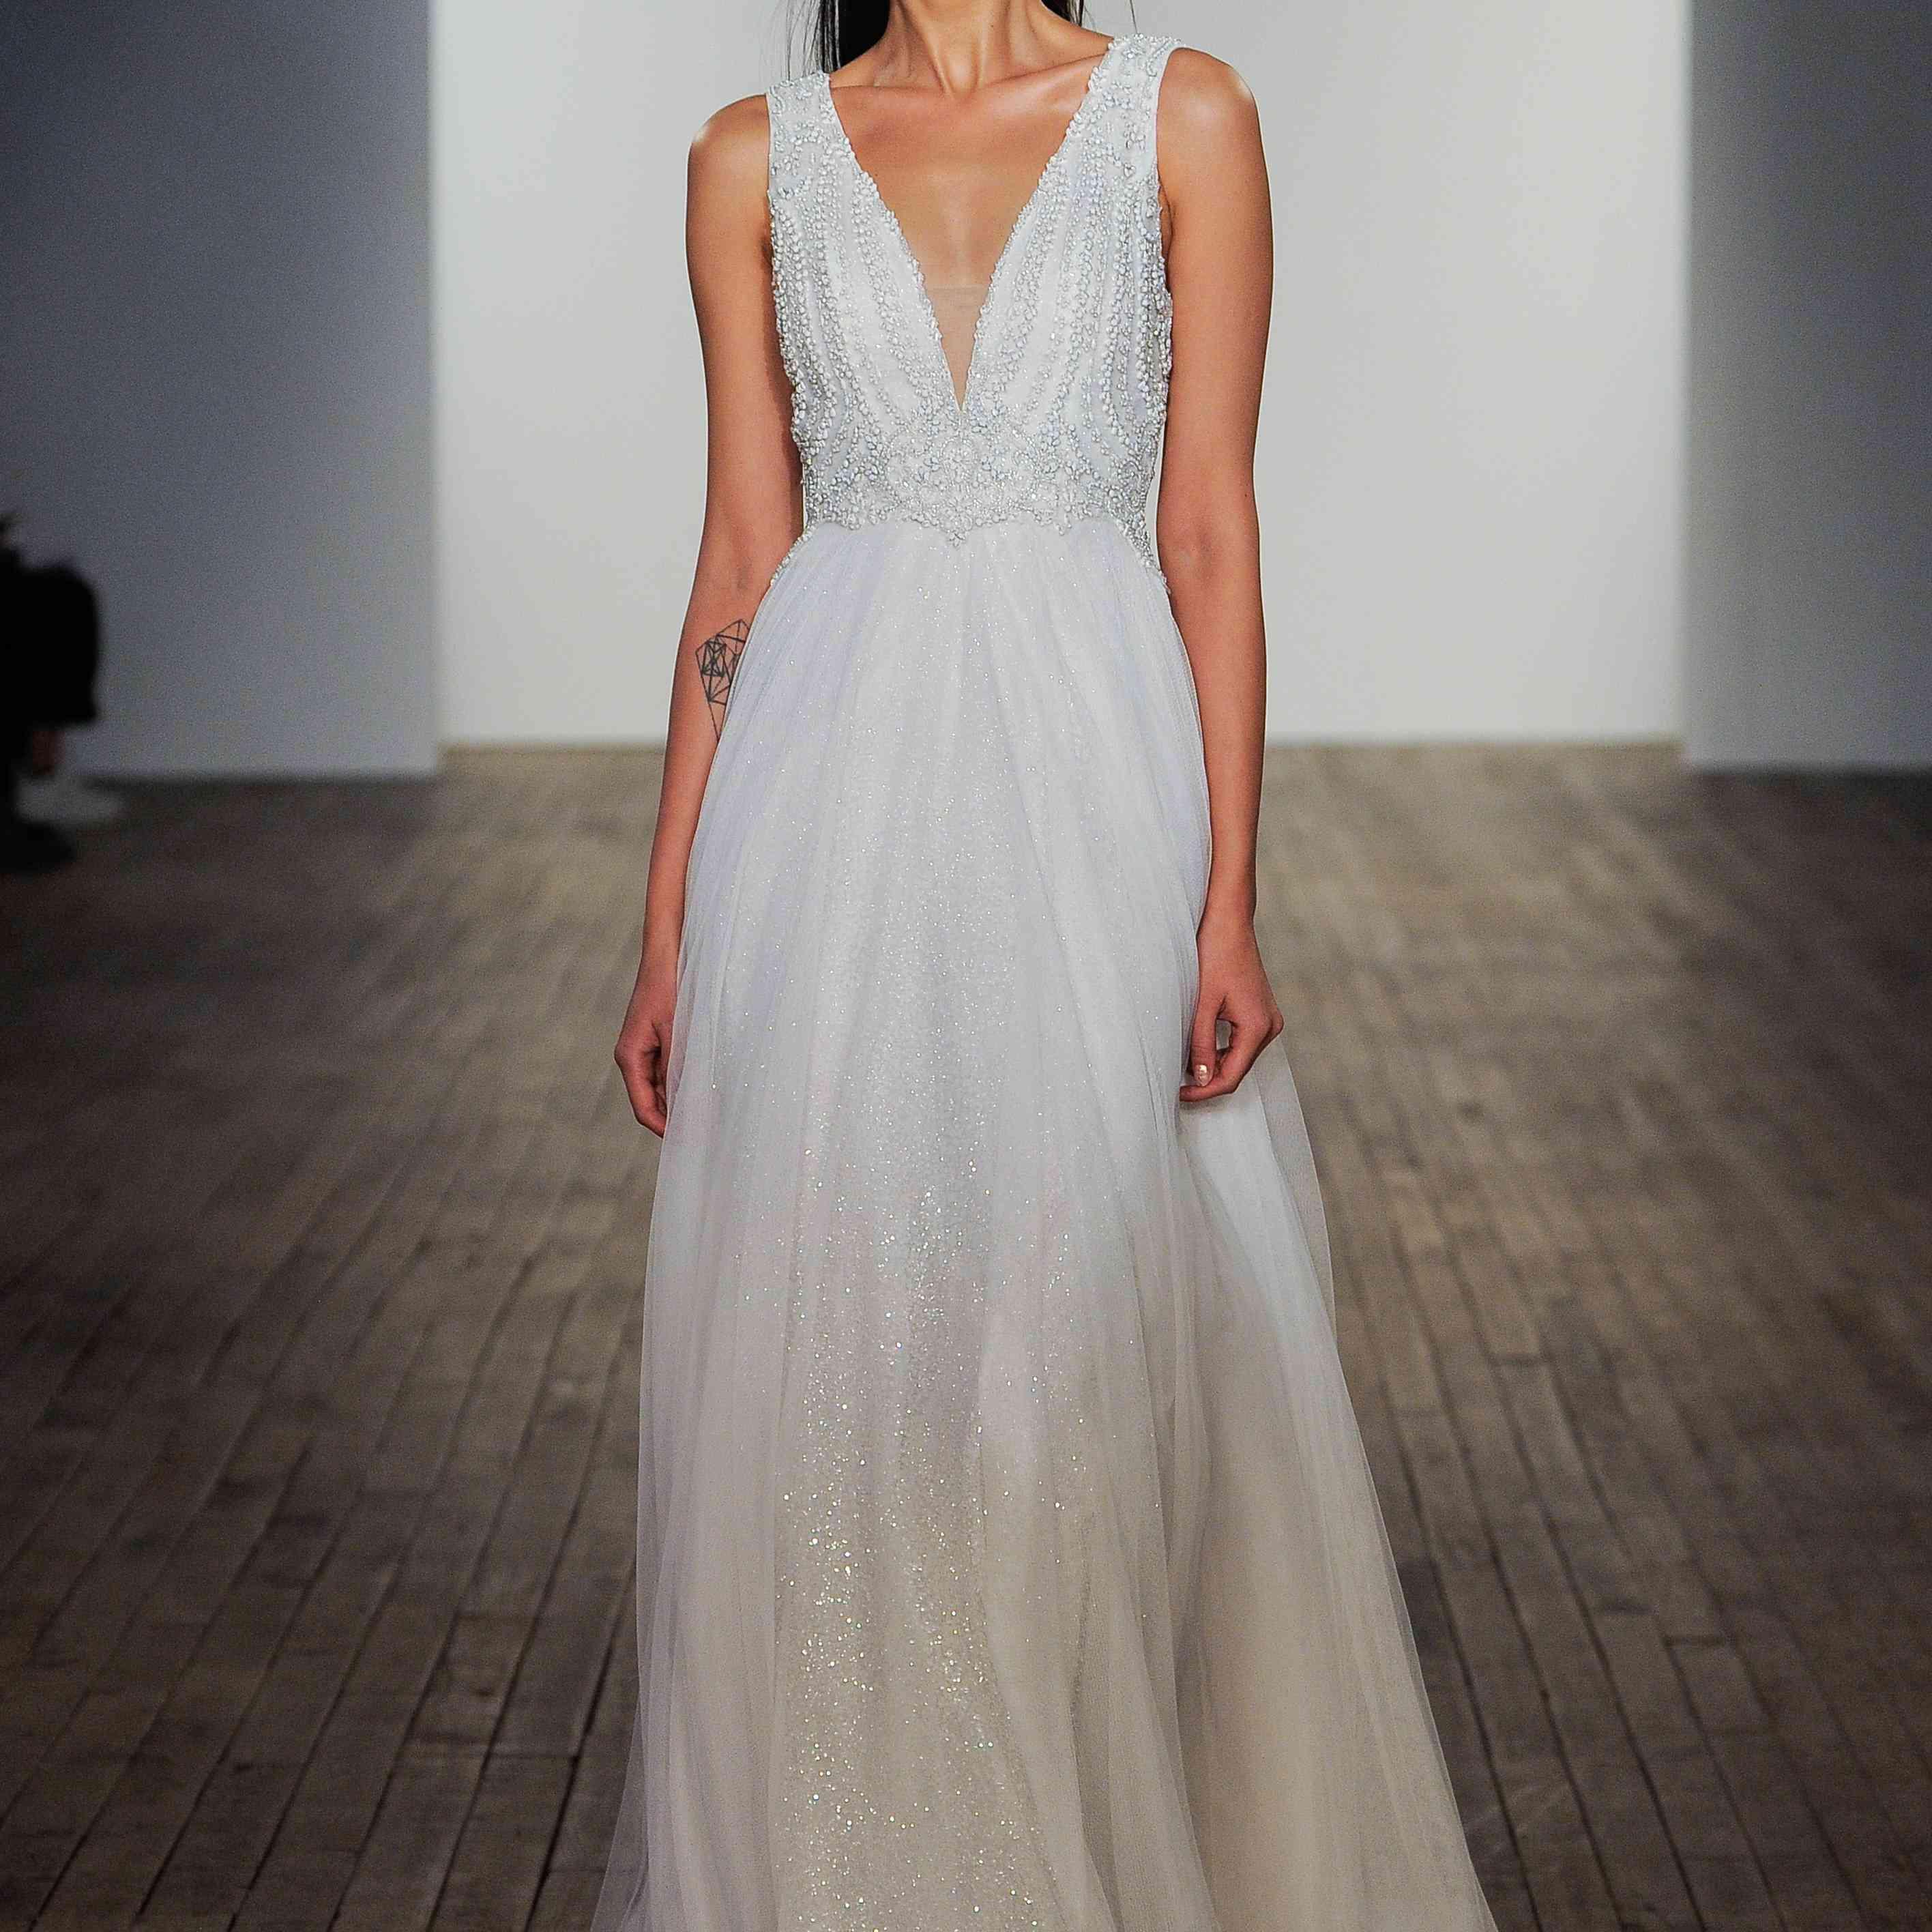 Maya embroidered sleeveless wedding dress